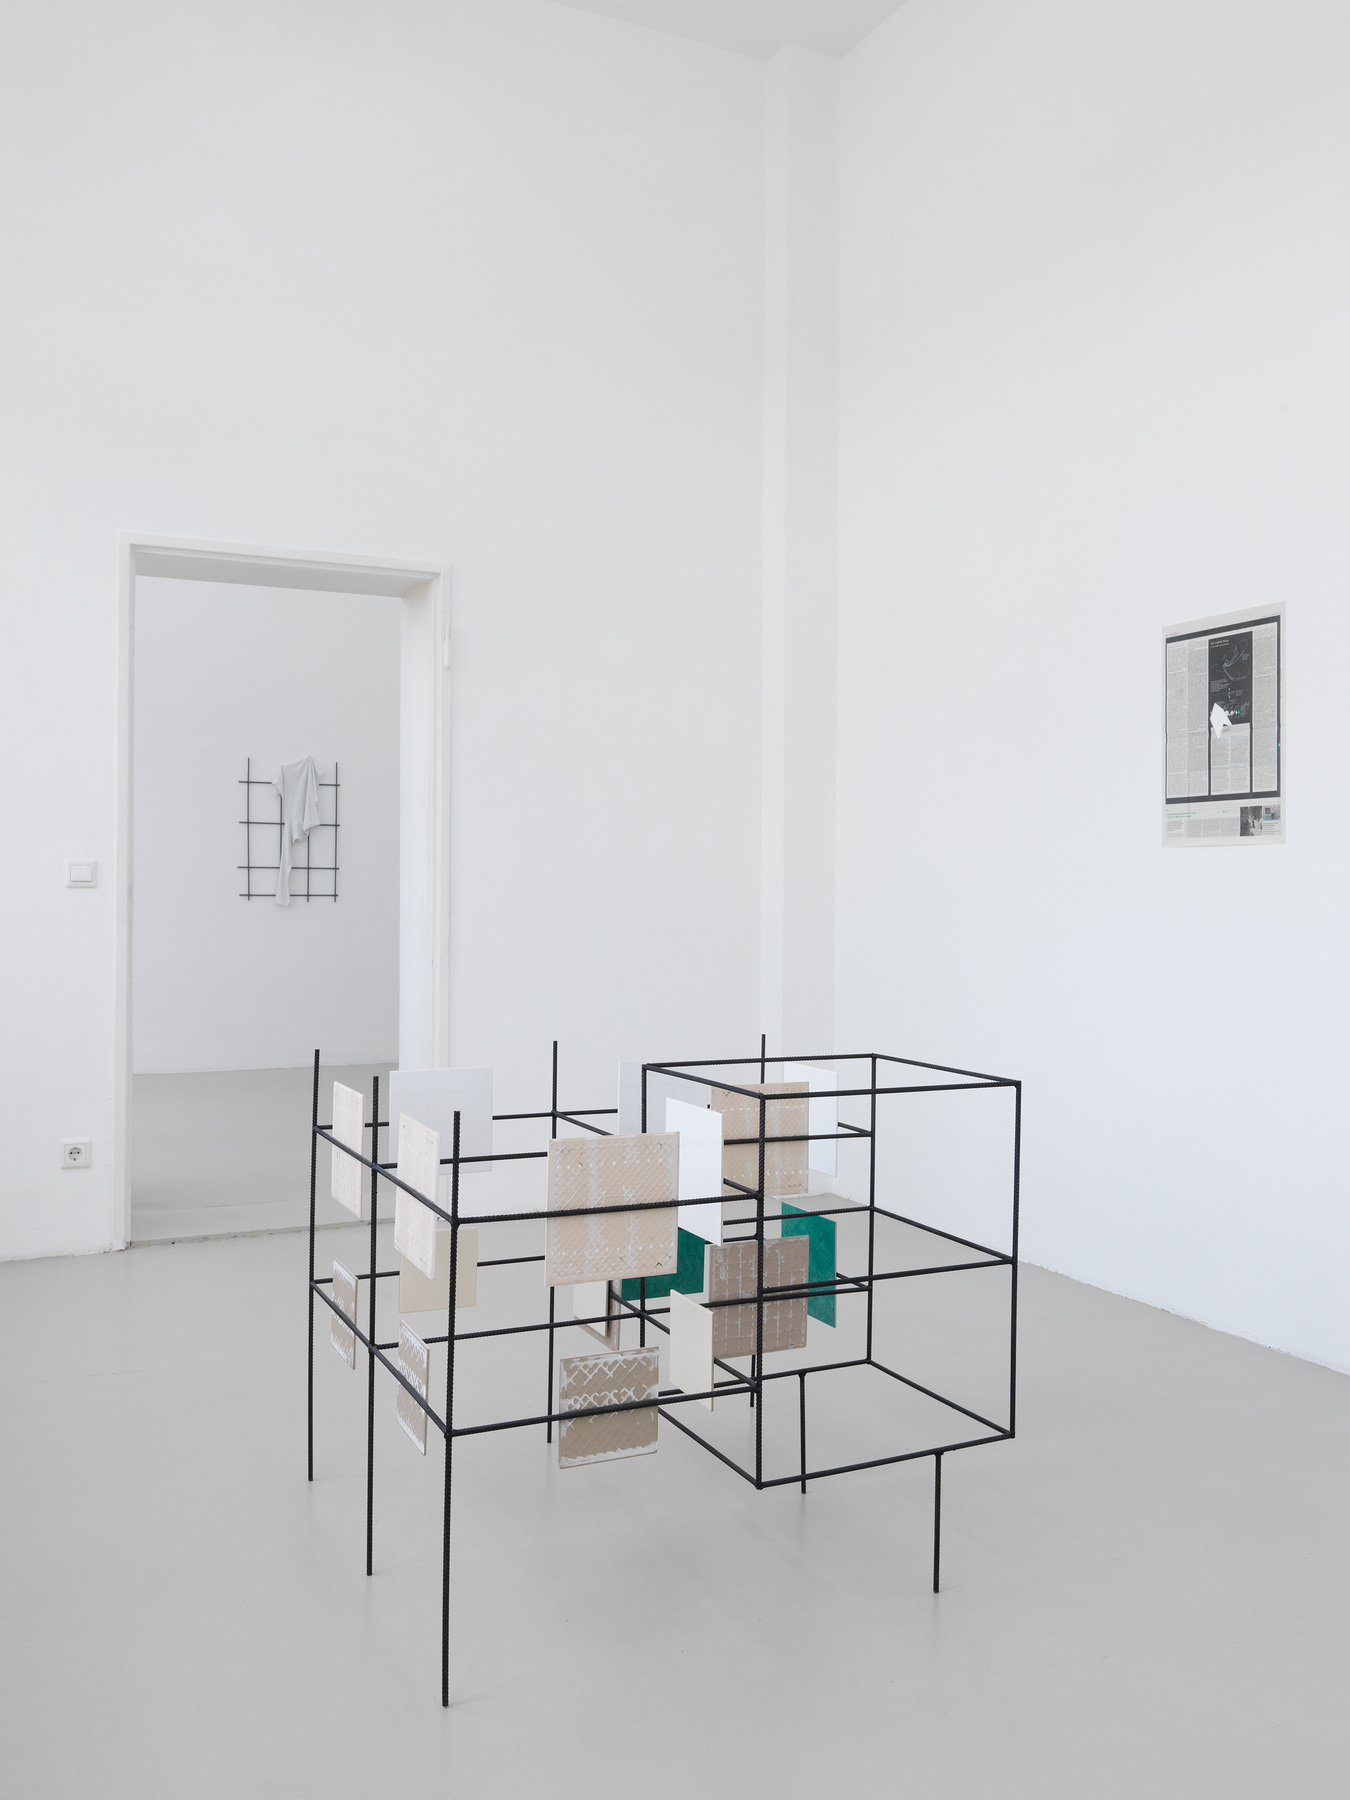 17_Edit Oderbolz_Kunstverein Nürnberg_2017